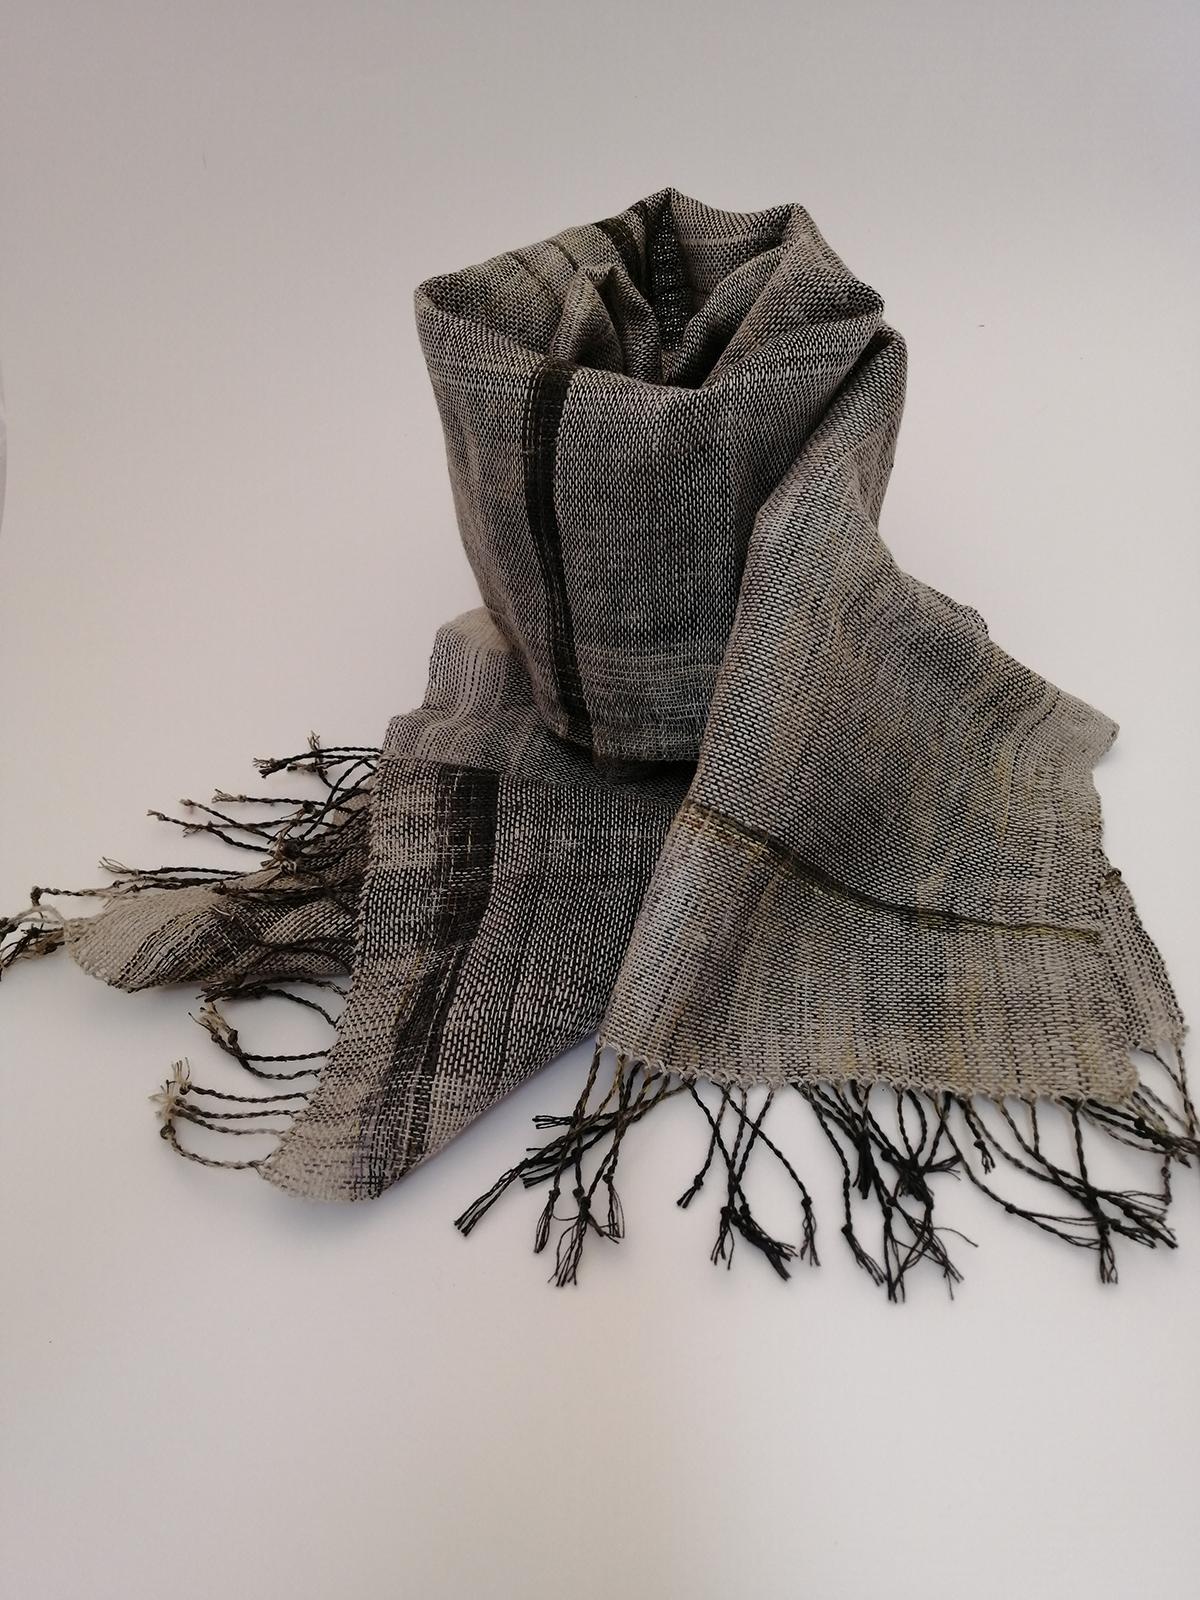 "Stephanie Jayce Stoker, Untitled (Scarf 1); Organic linen, natural dye & eco-printed warp, 12"" x 36"", 2020 (Photo Credit: Jennifer Cake)"